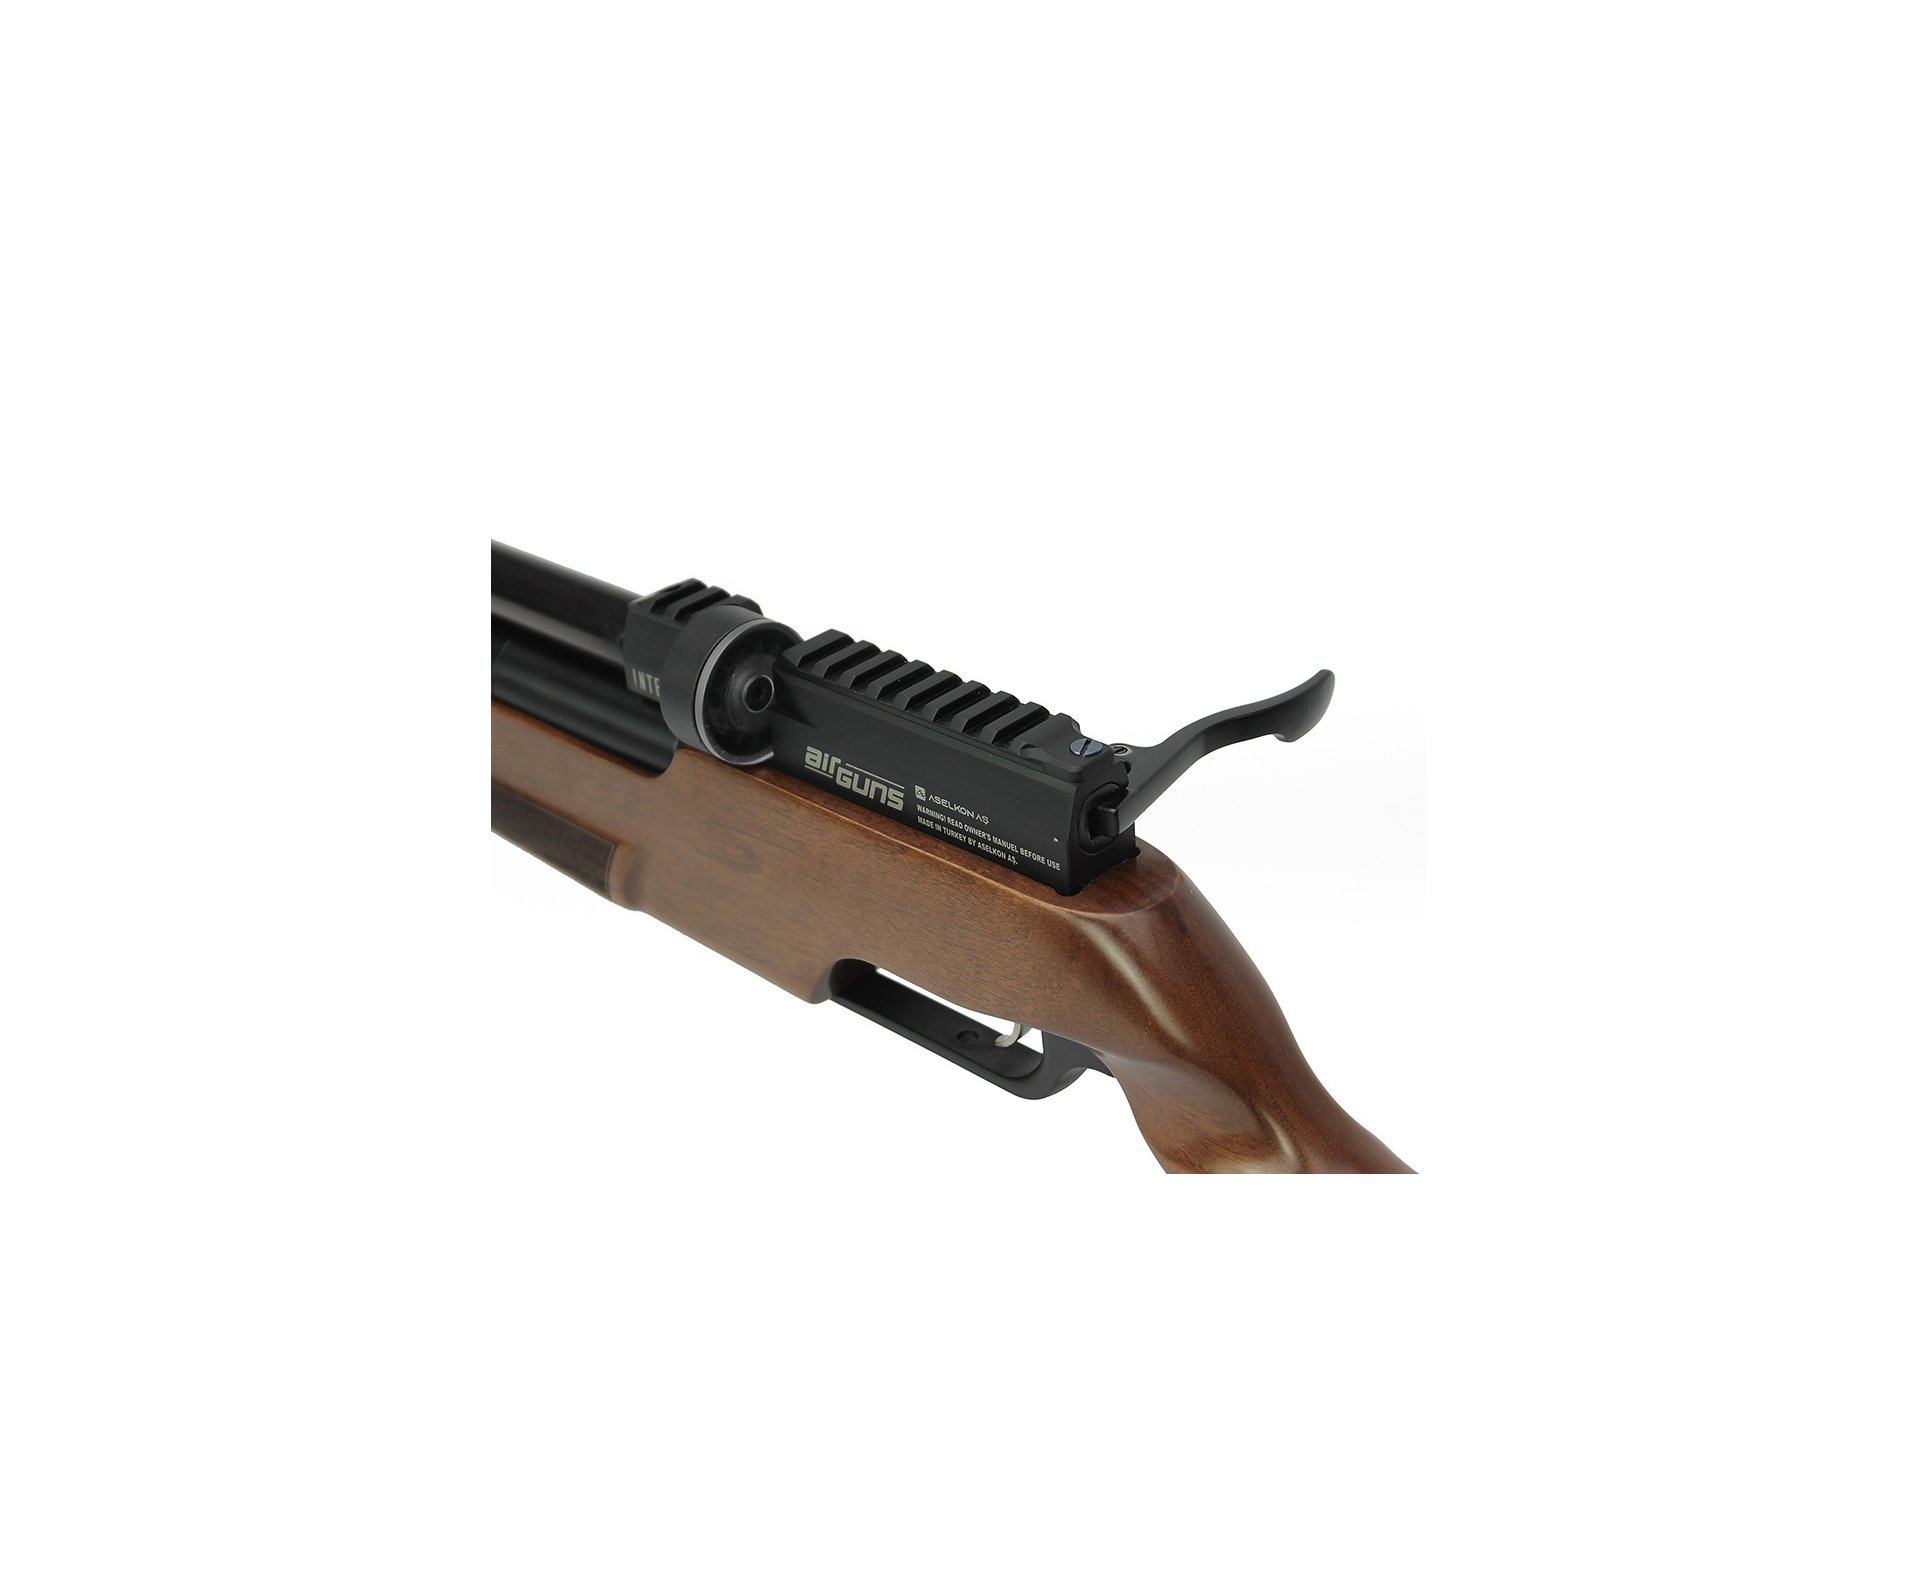 Artefato de Pressão PCP MX5 Matte Black Wood Regulated 5.5mm Aselkon